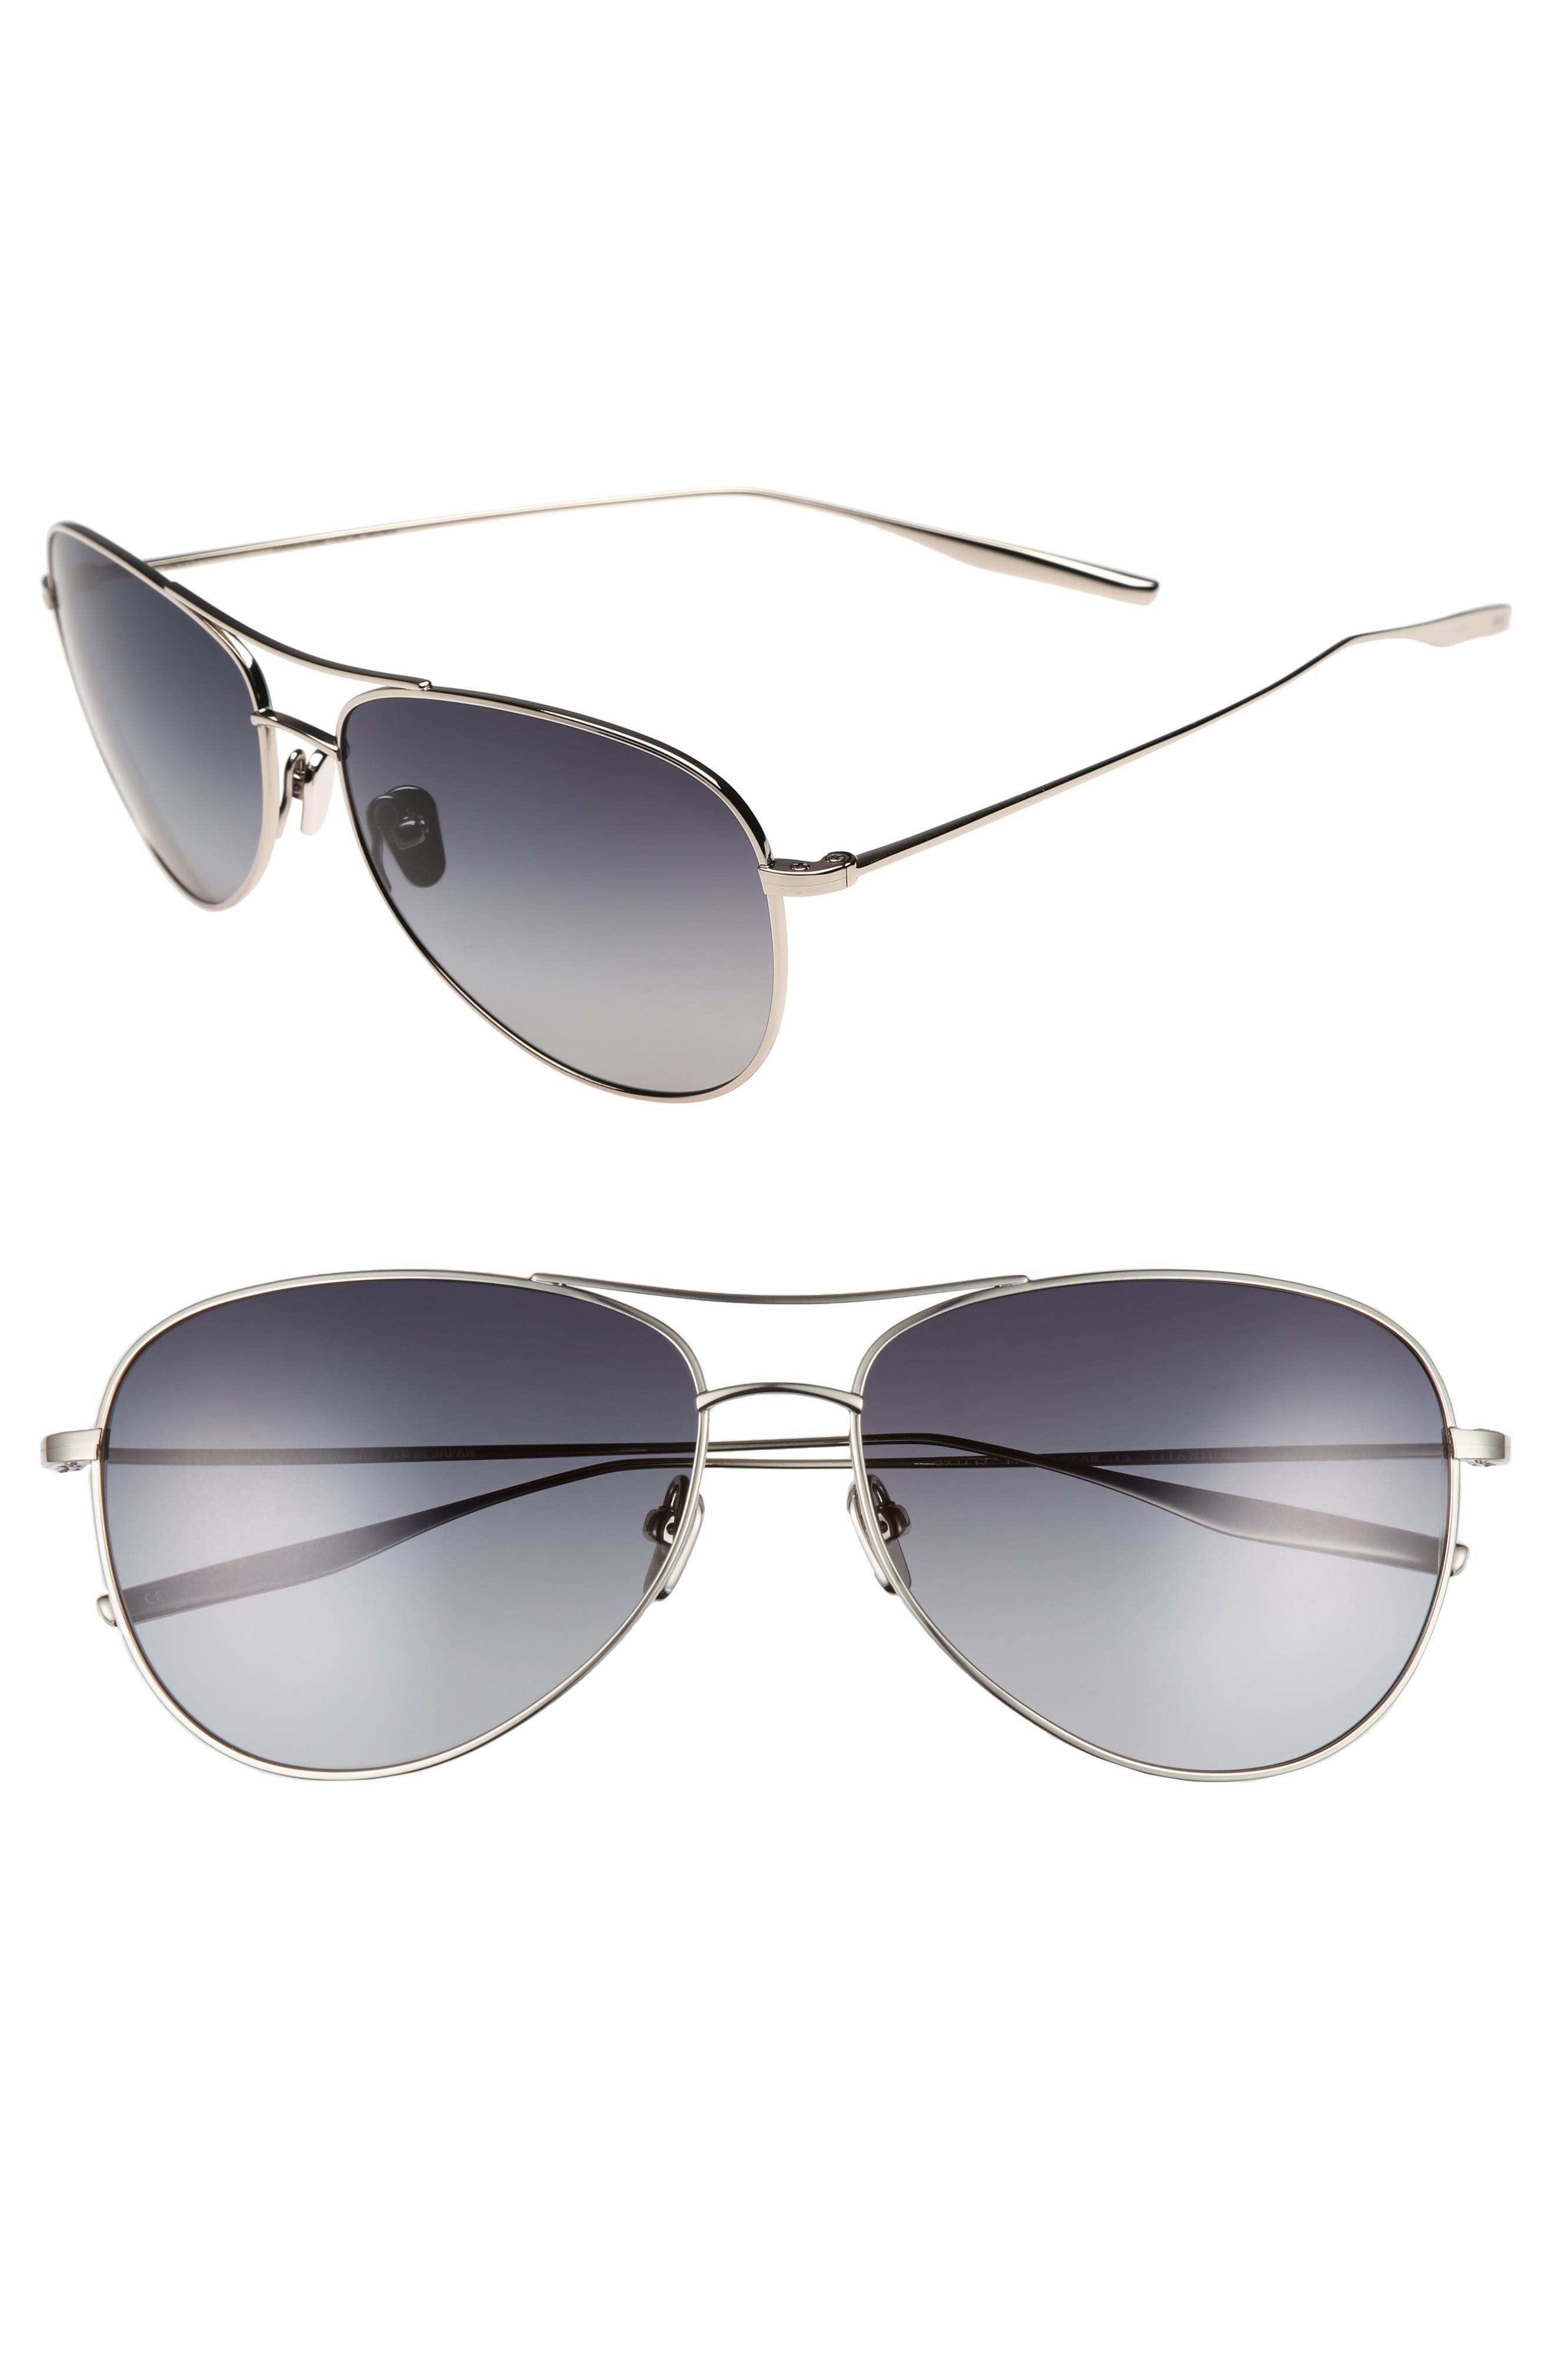 SALT McKean 59mm Aviator Sunglasses